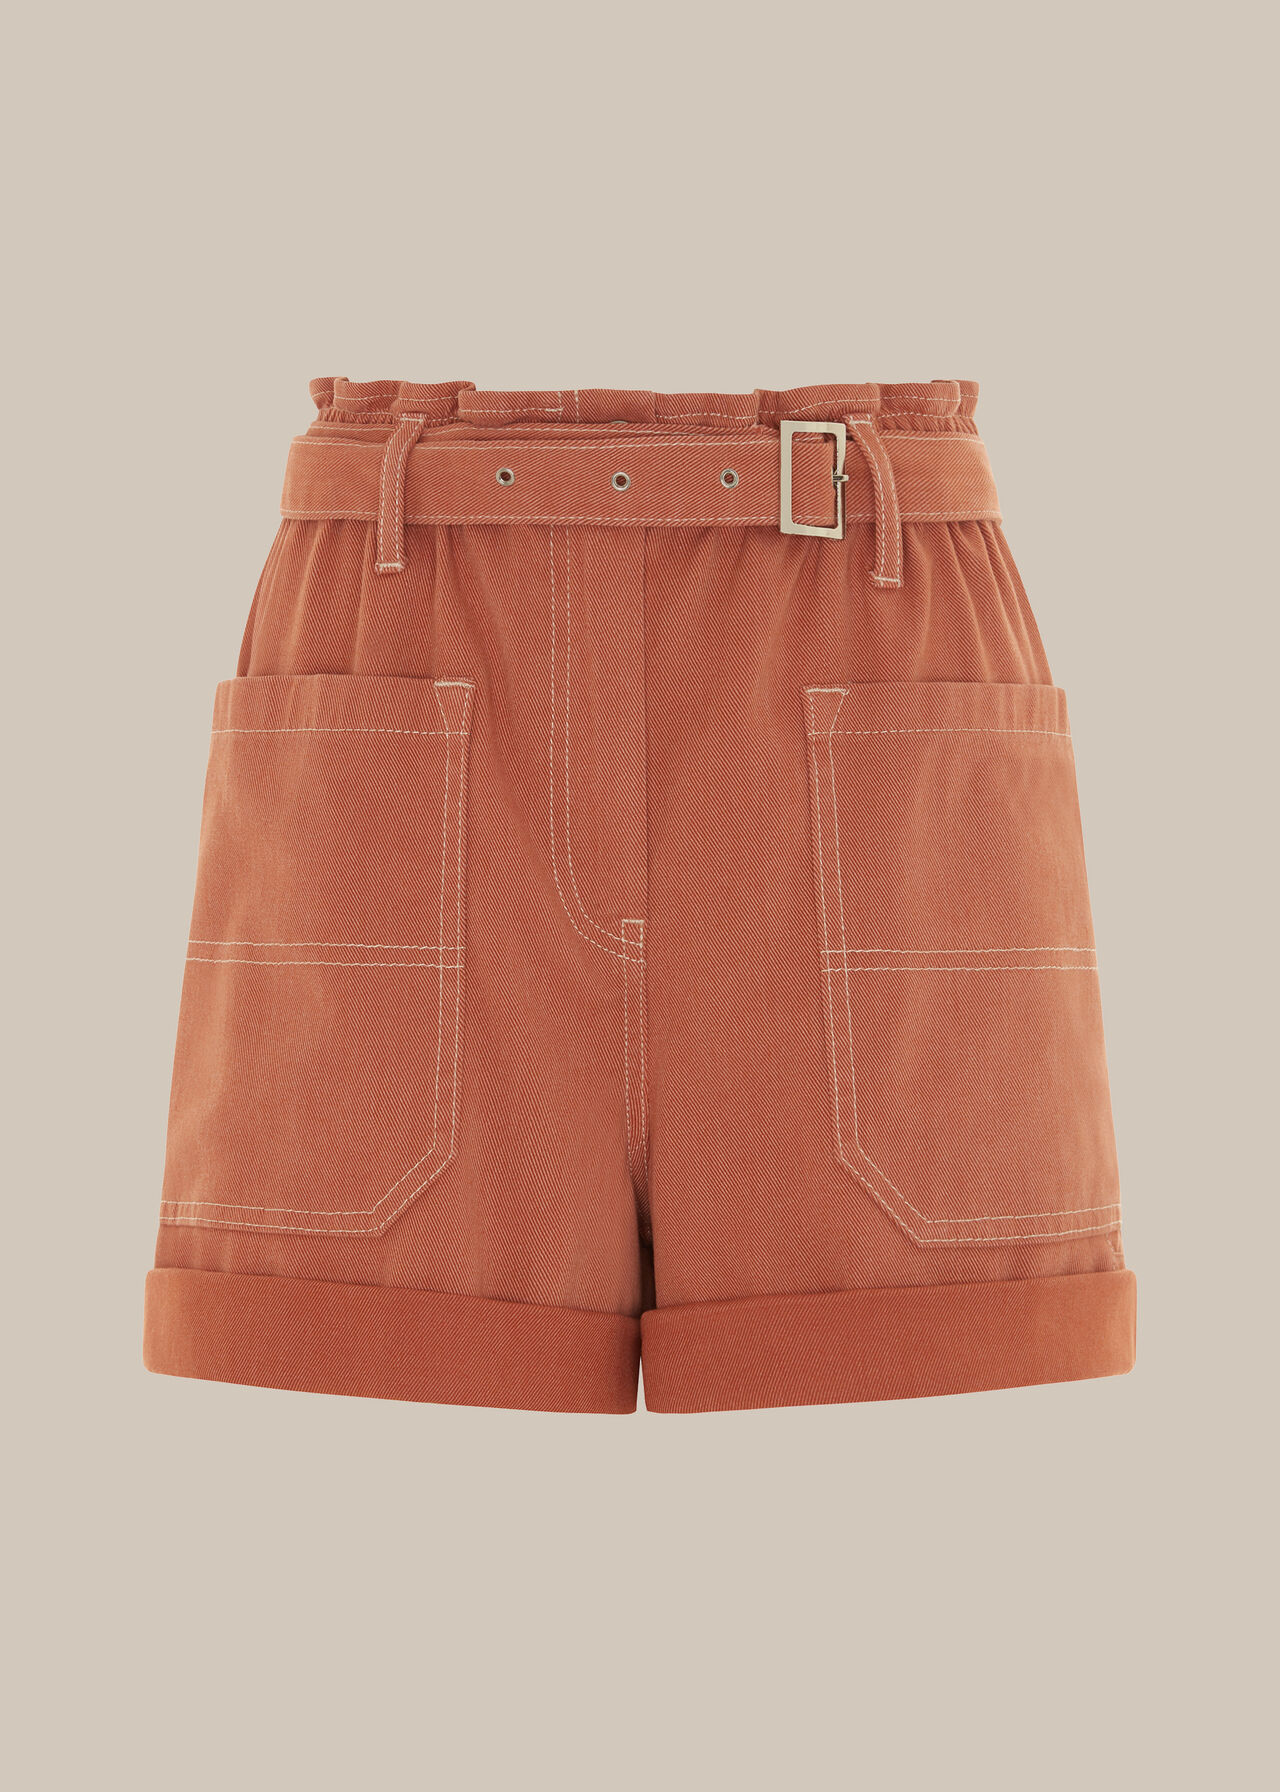 Tie Waist Cargo Pocket Short Coral/Multi